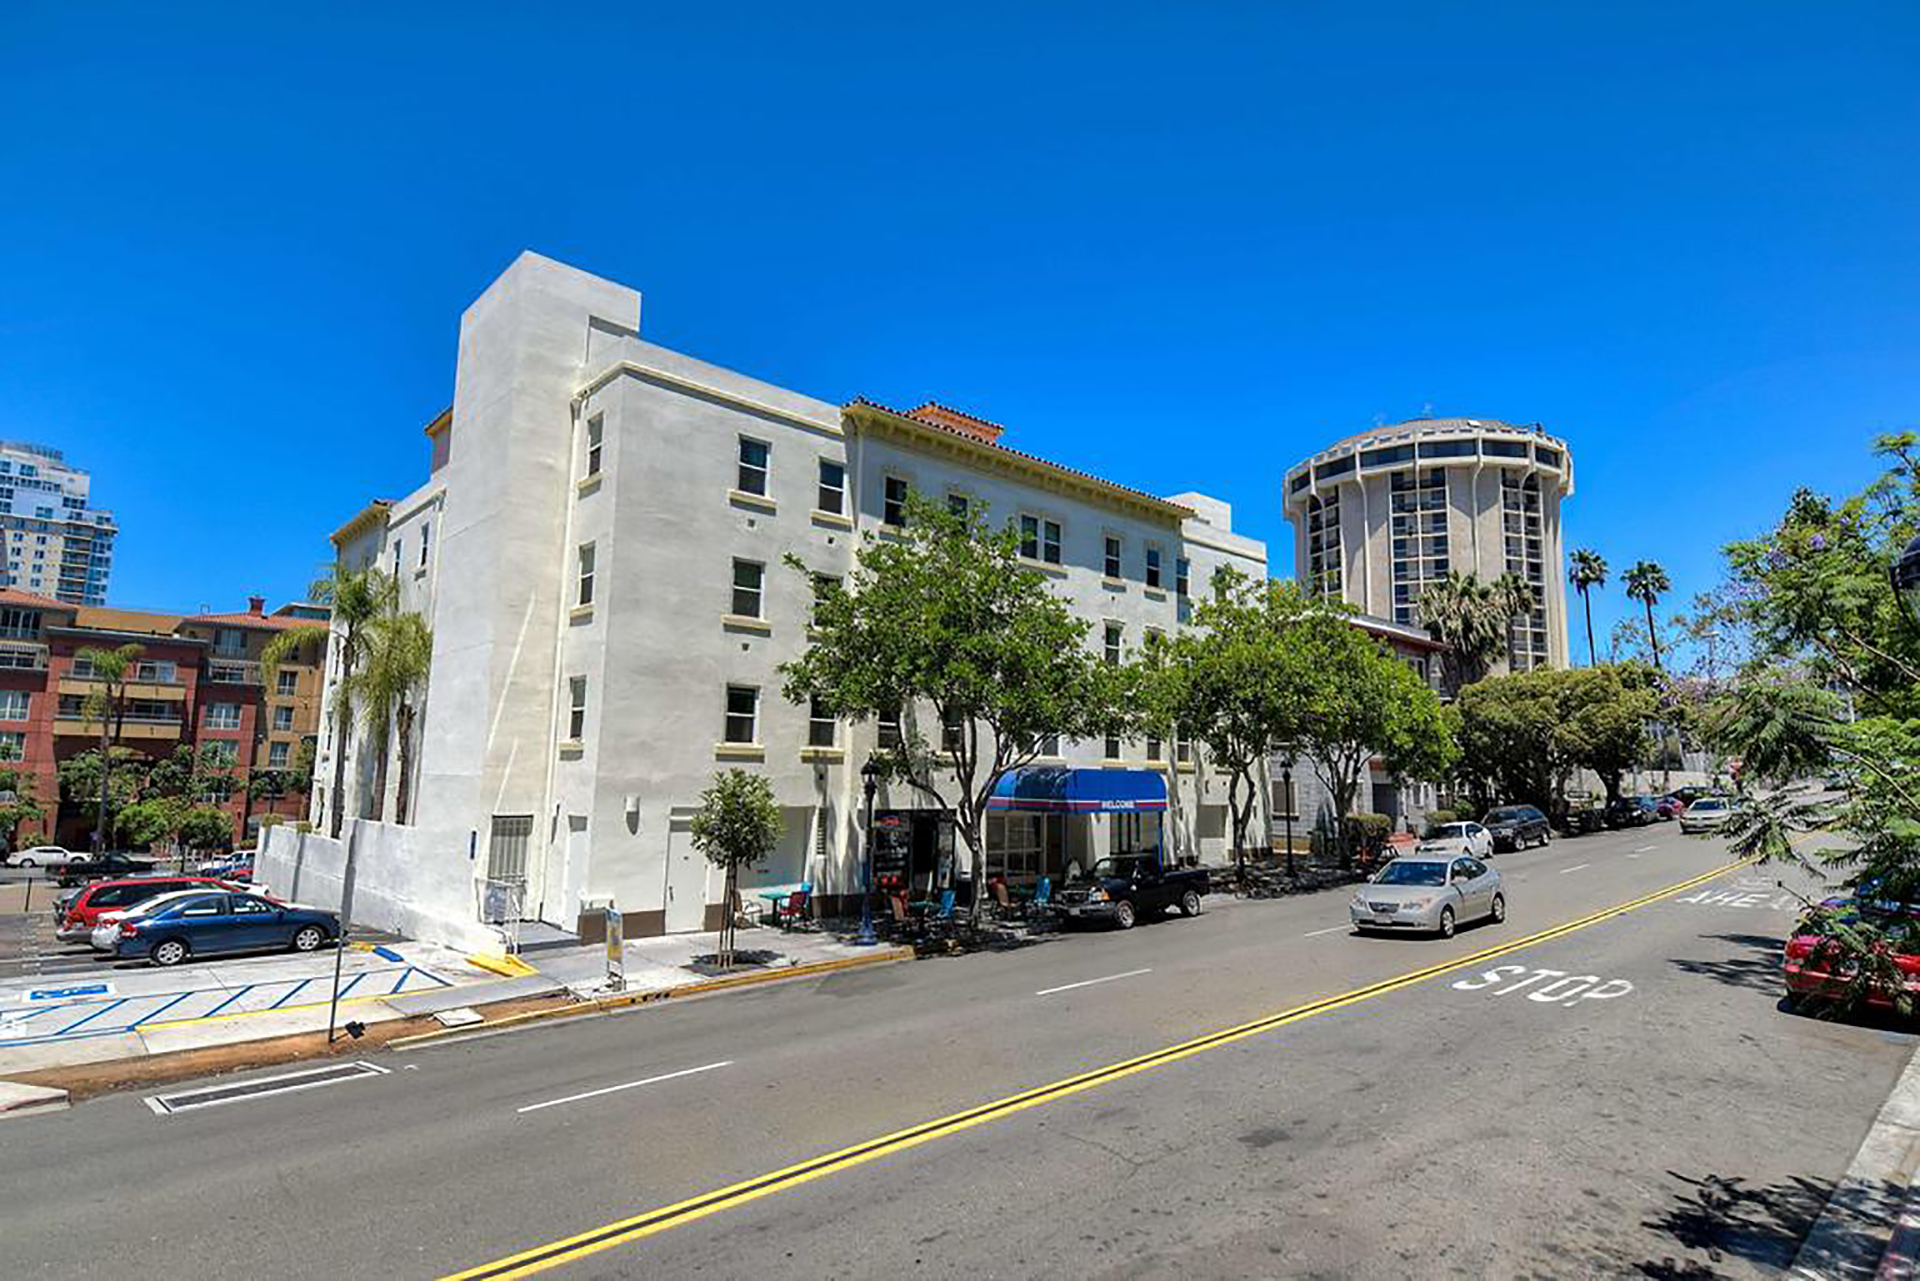 Motel 6 San Diego Donwtown